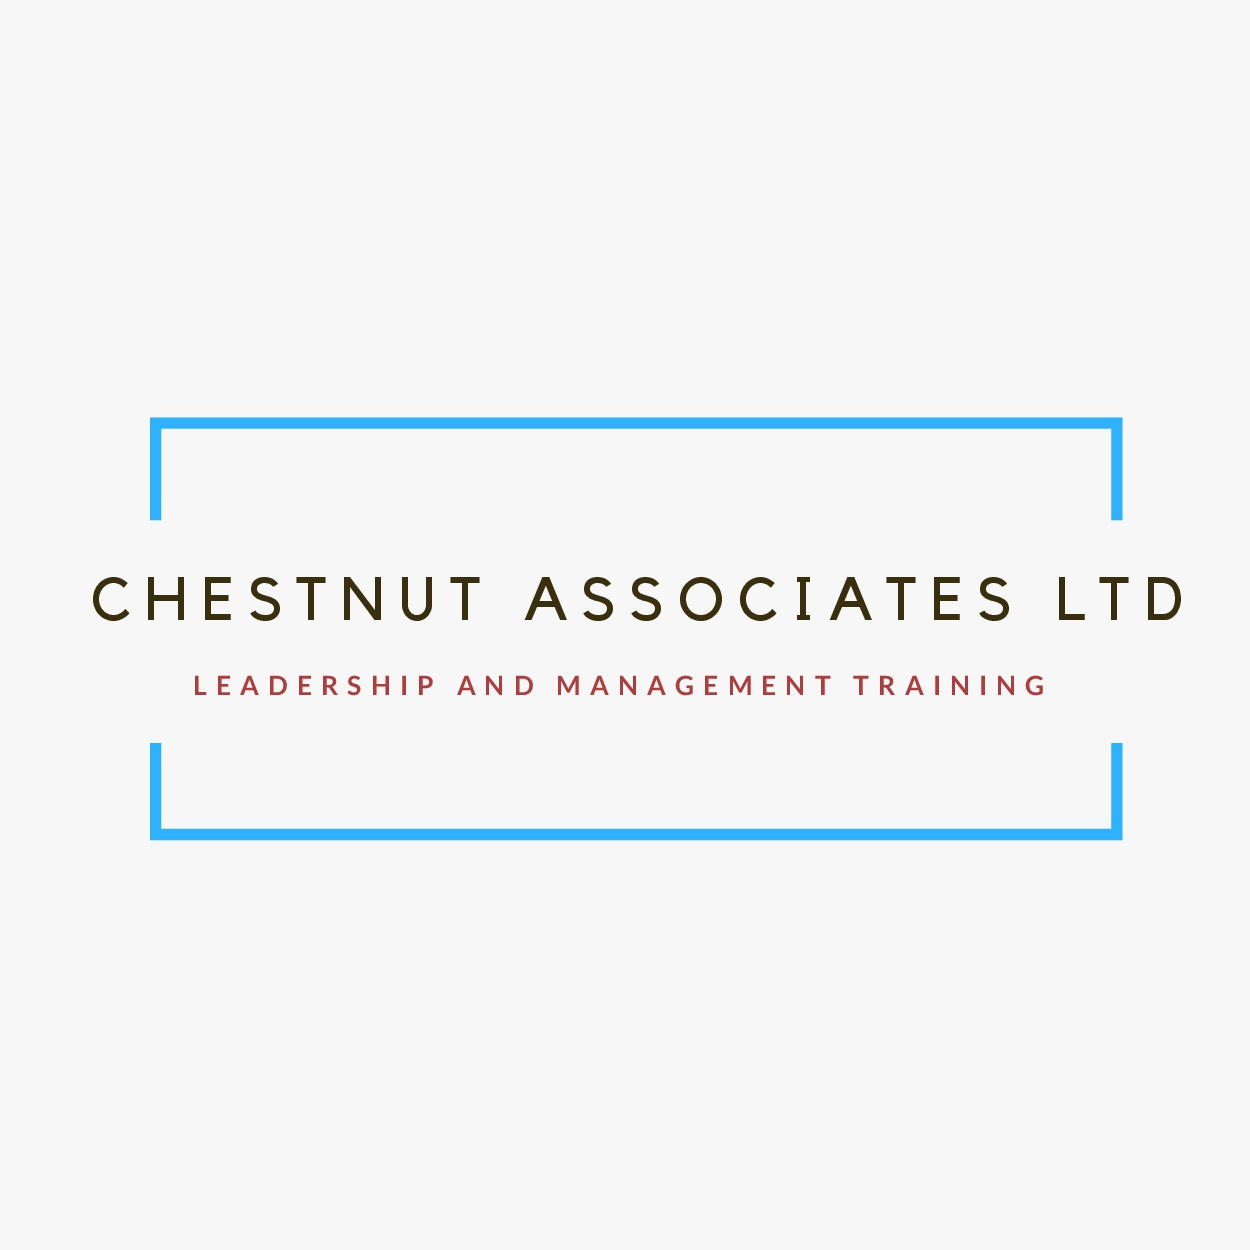 Chestnut Associates